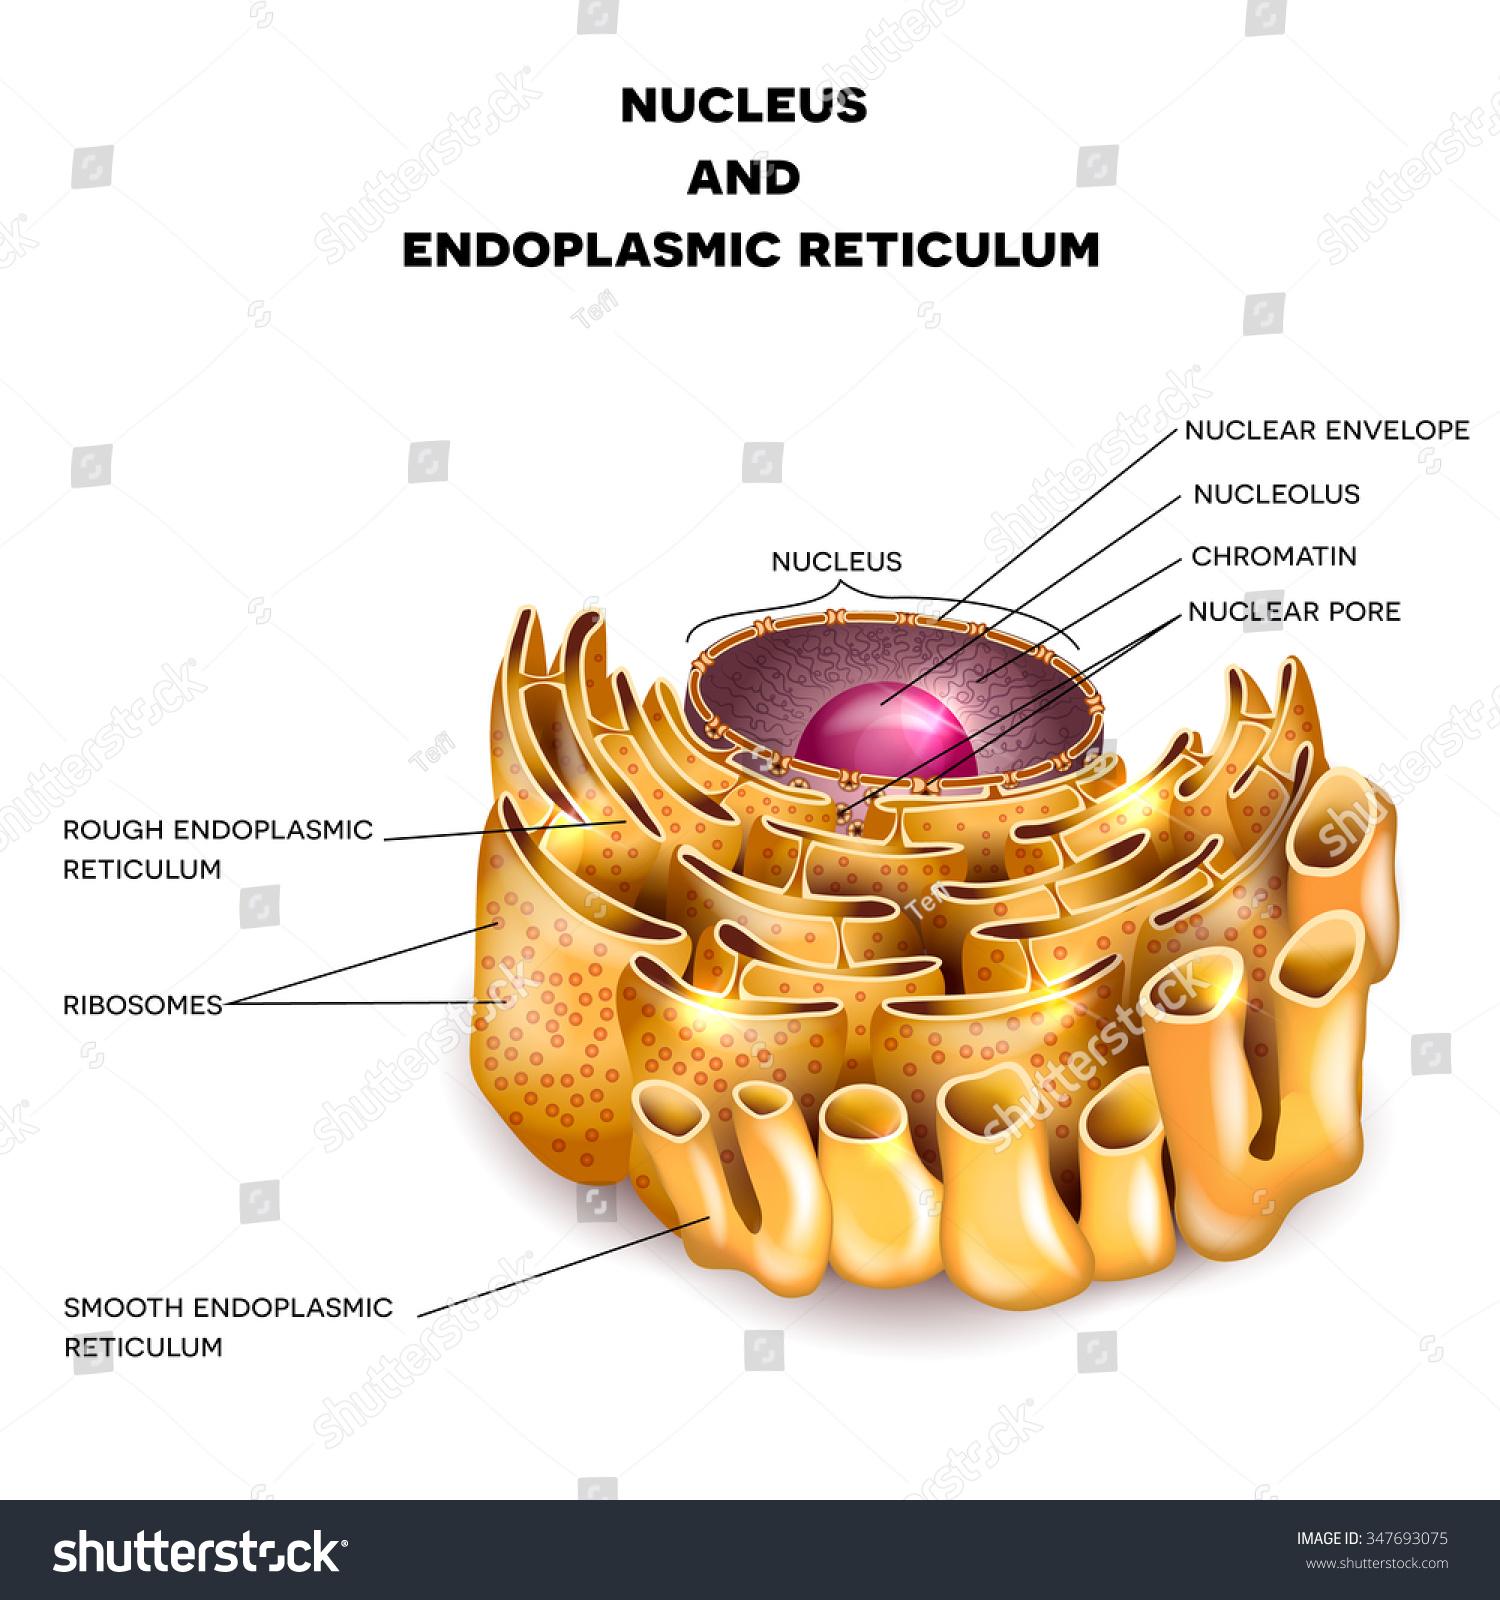 Cell Nucleus Endoplasmic Reticulum Detailed Anatomy Stock Photo ...